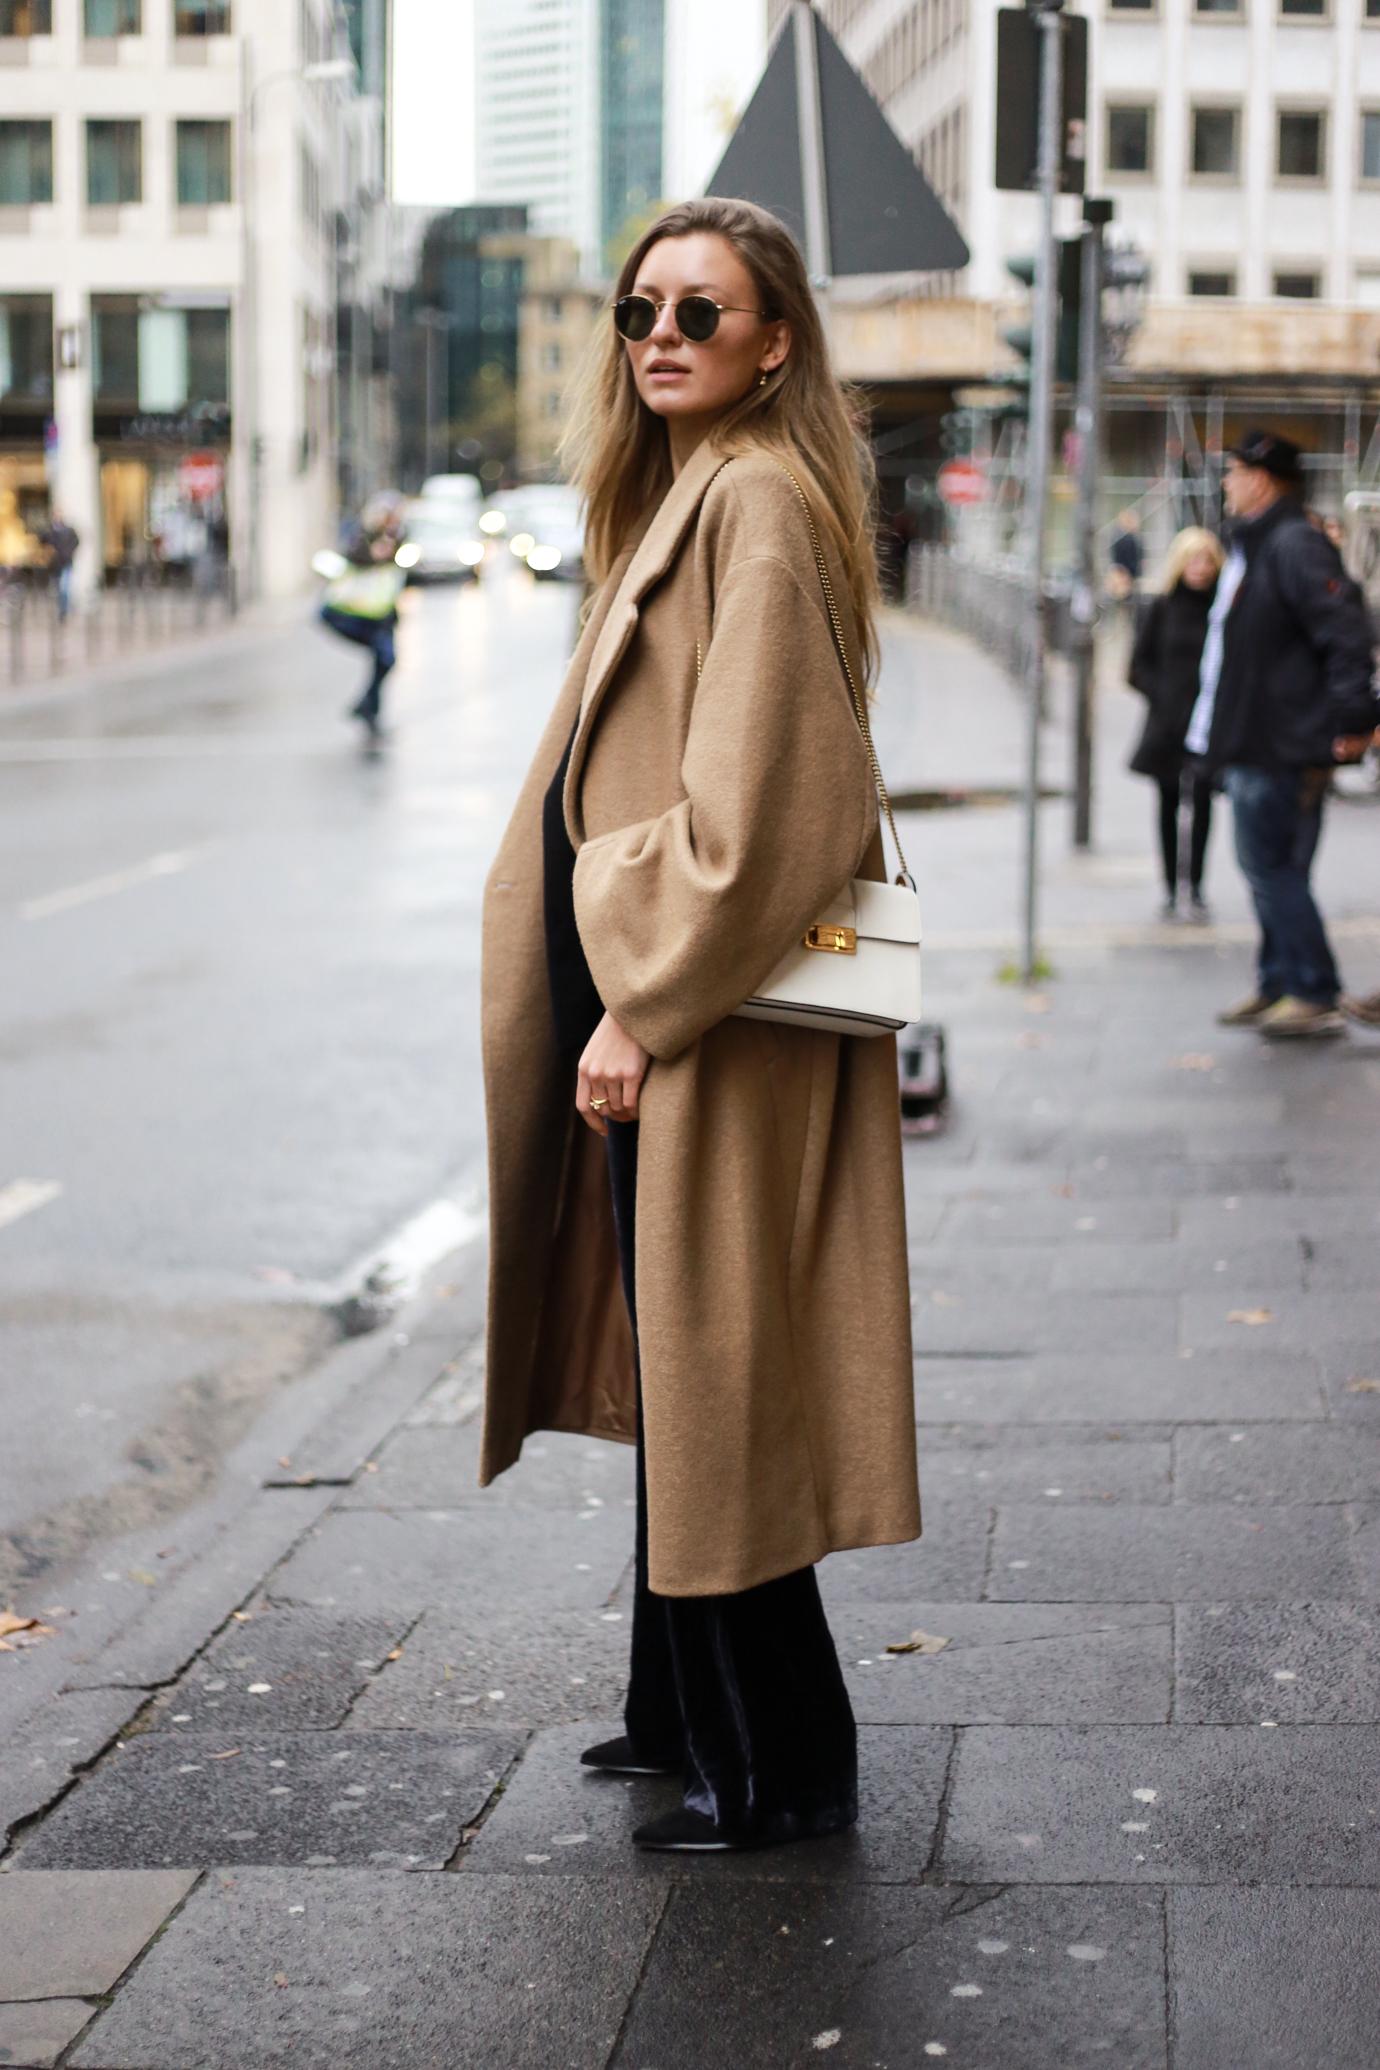 velvet-band-shirt-camel-coat-outfit-livia-auer-6524